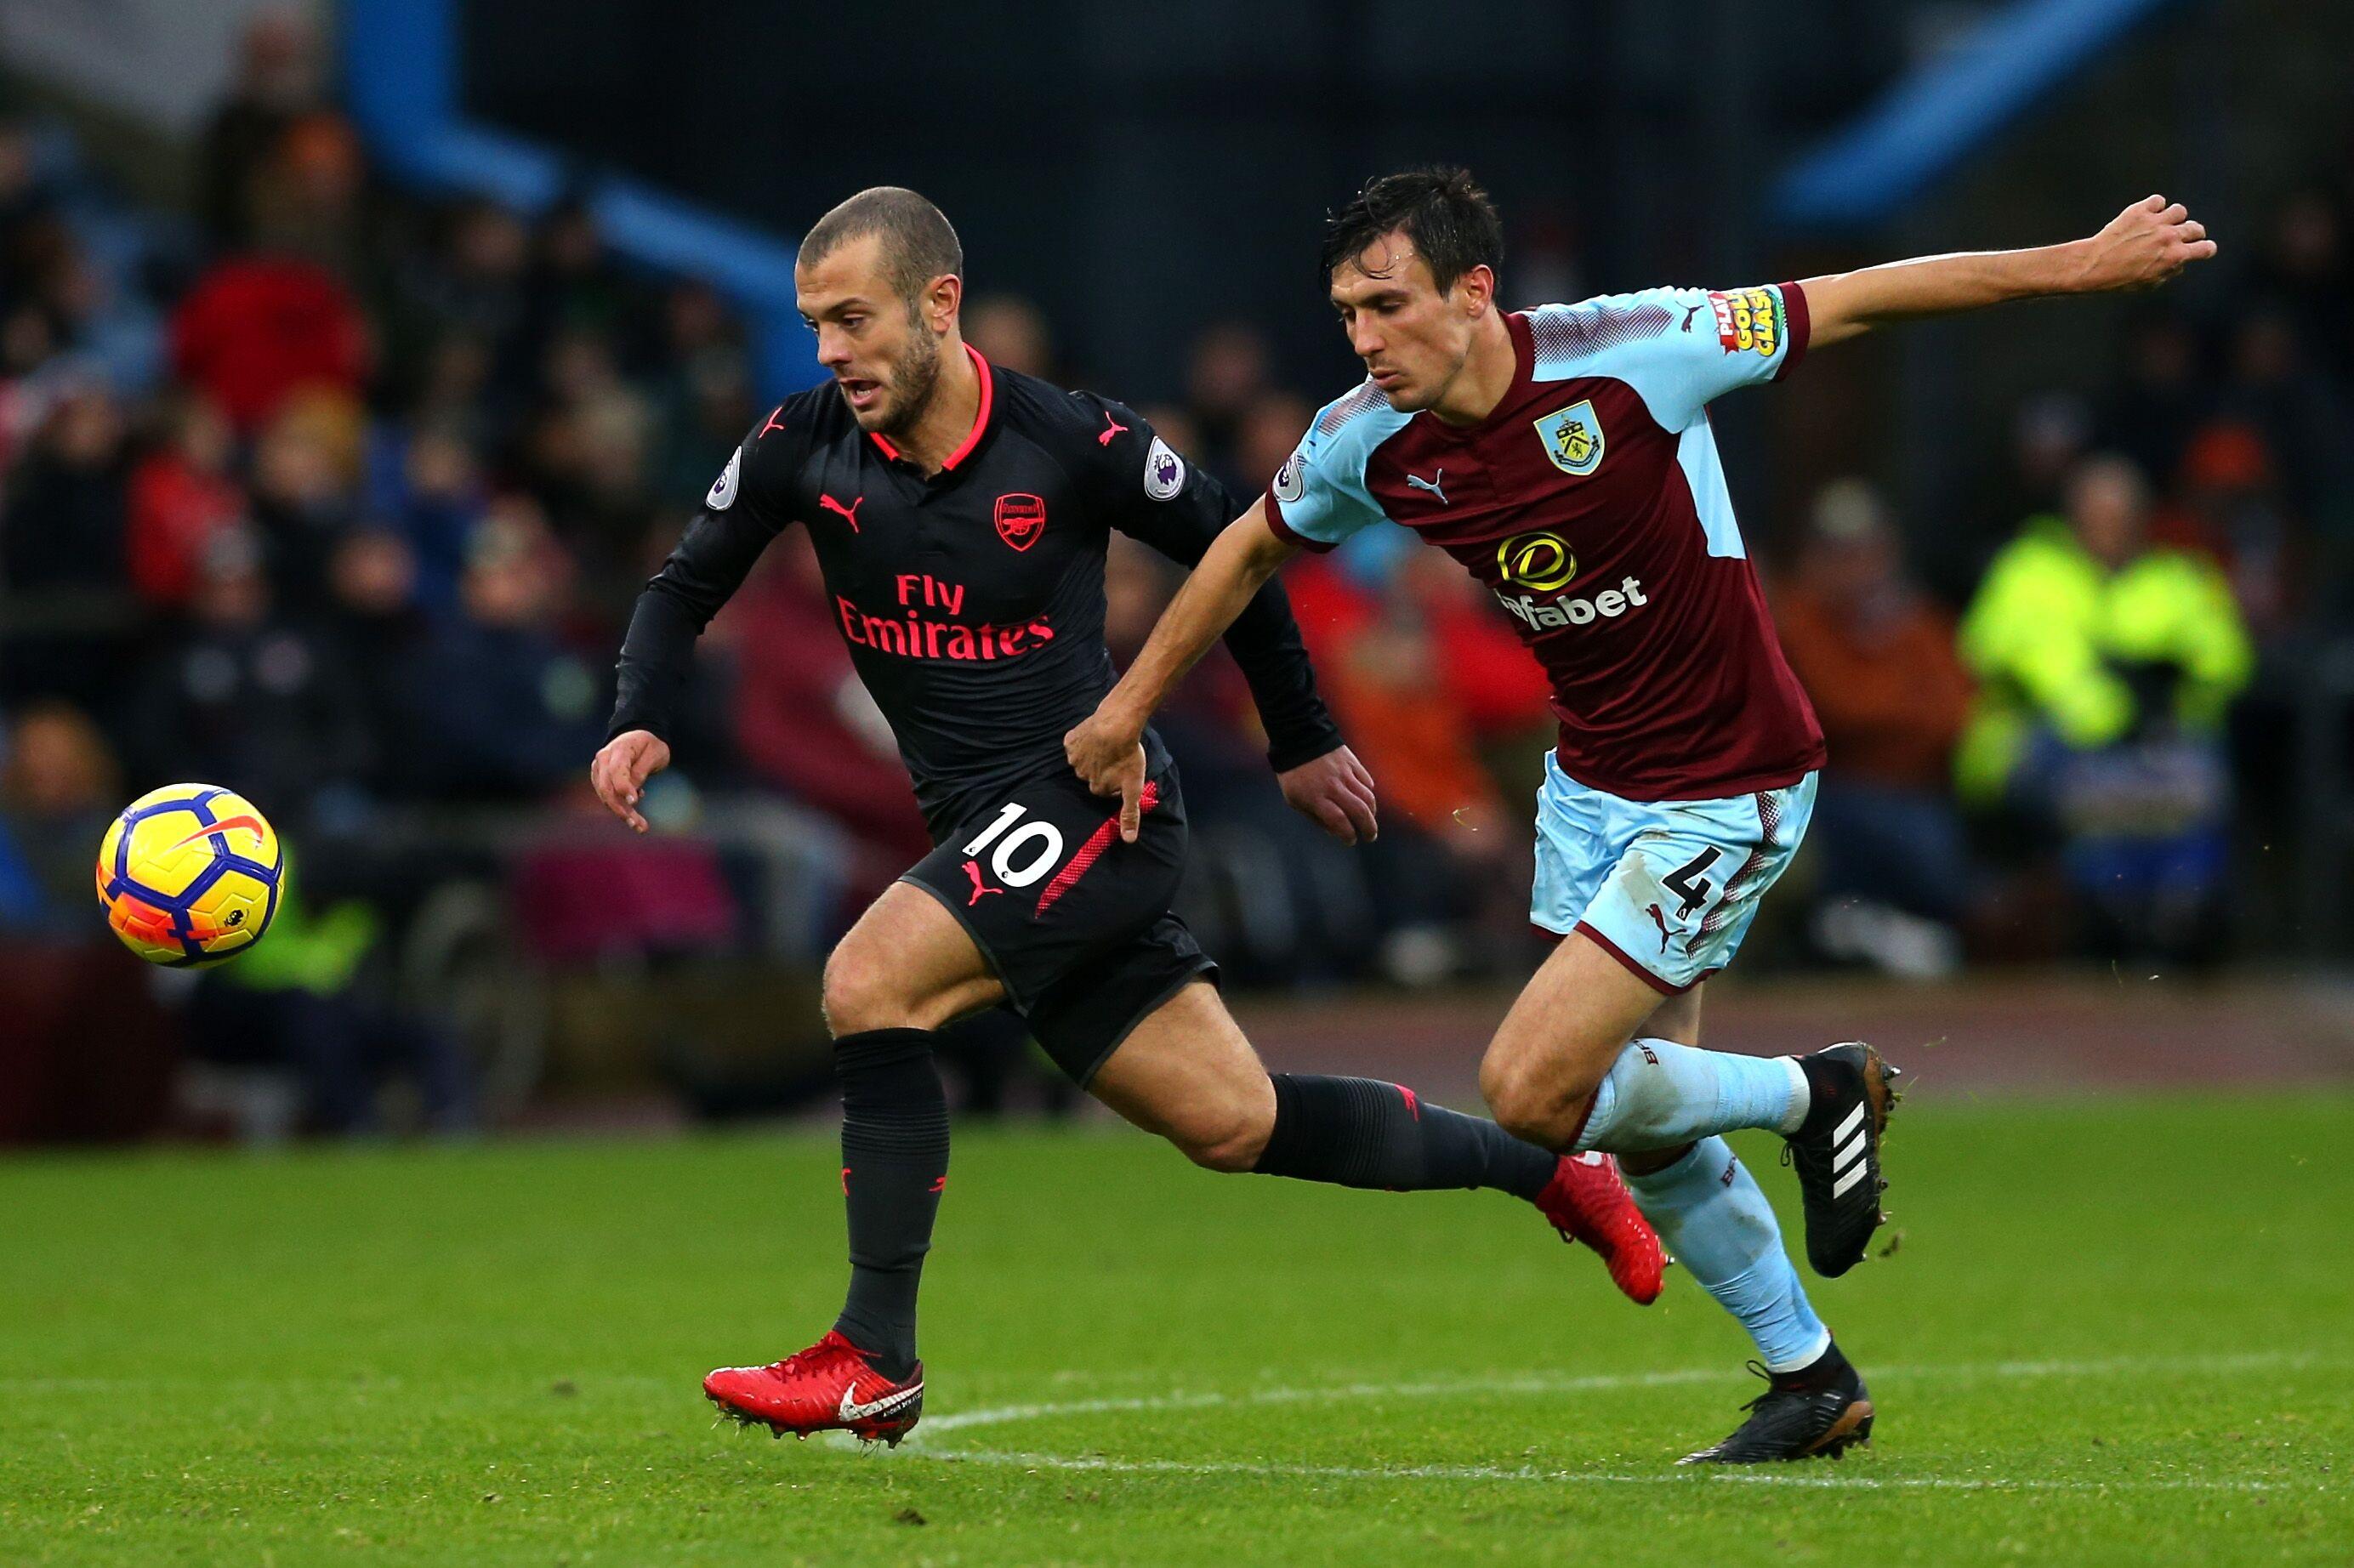 Huddersfield Vs Arsenal: Arsenal Vs Huddersfield Town: Jack Wilshere's Chance